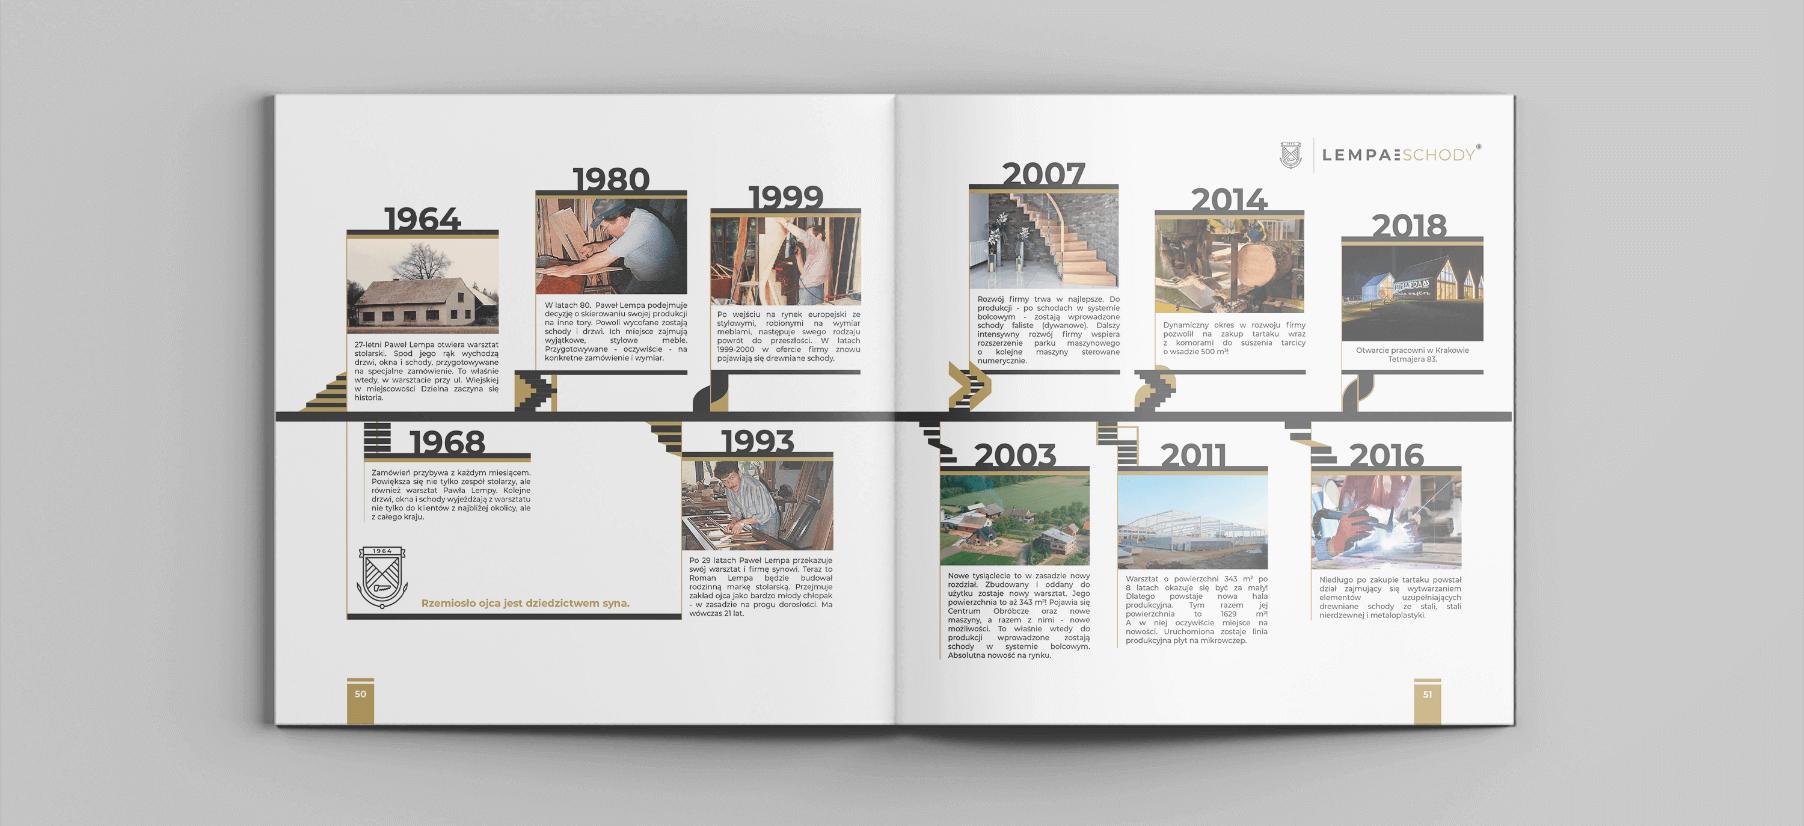 katalog-produktowy-lempa-1